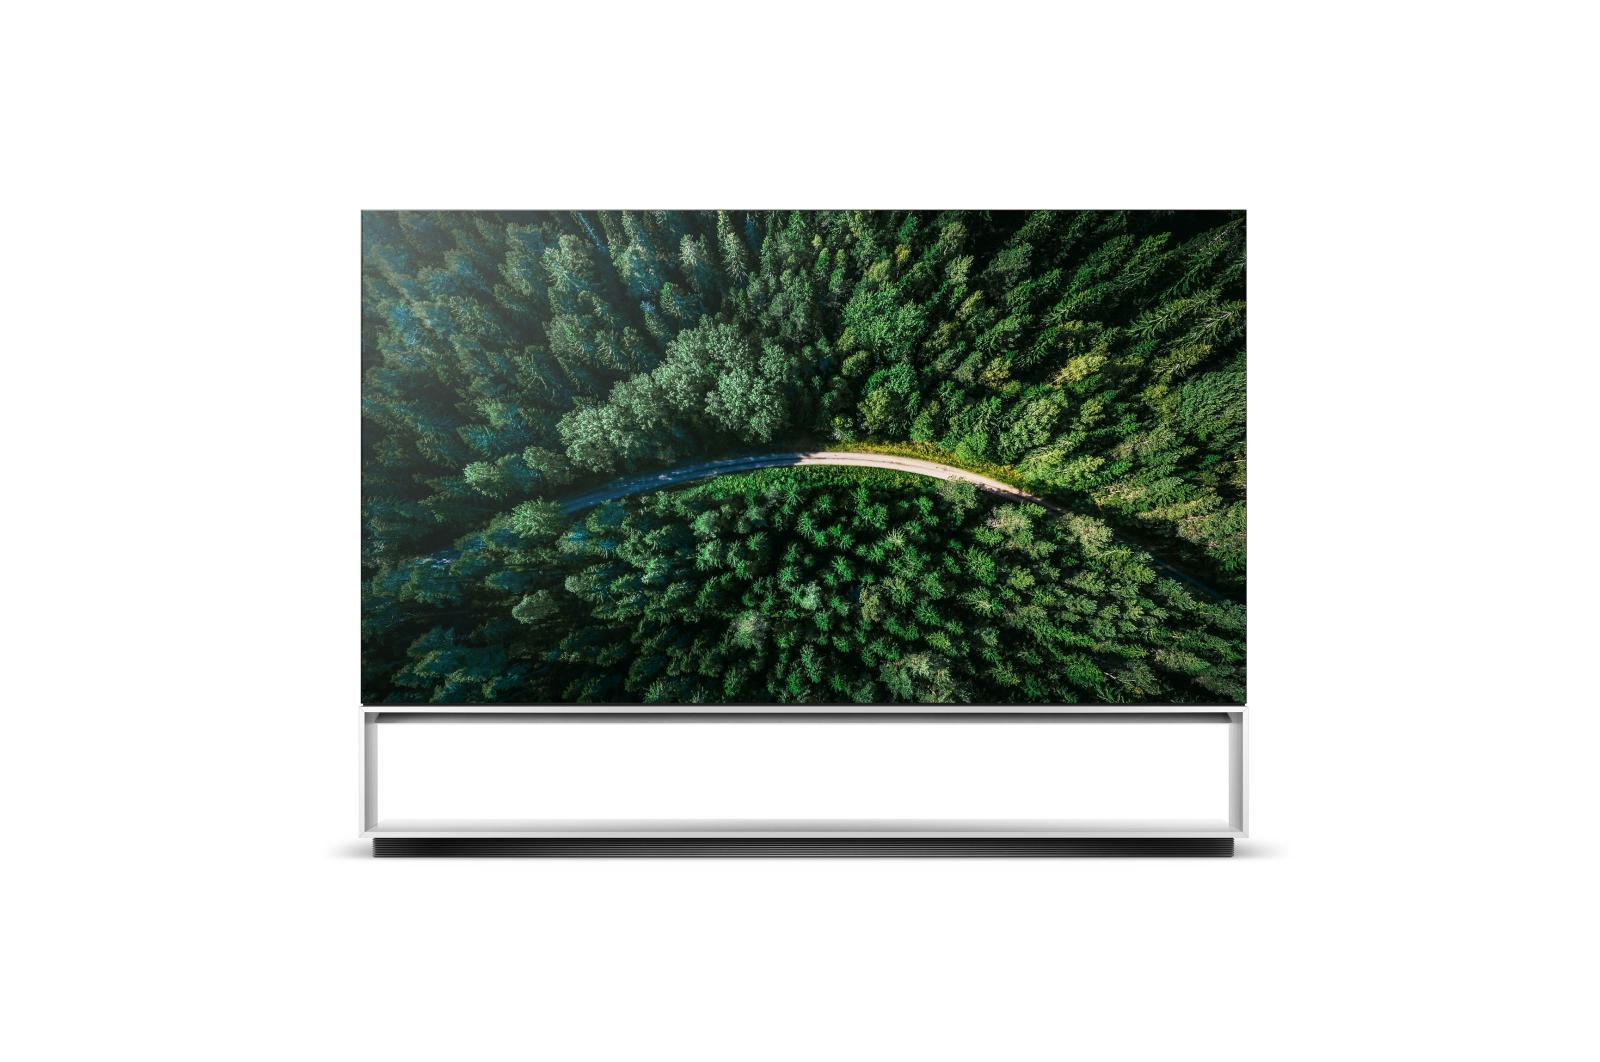 88 TV OLED Real 8K Έξυπνος Επεξεργαστής α9 2ης γενιάς - OLED88Z9PLA main image